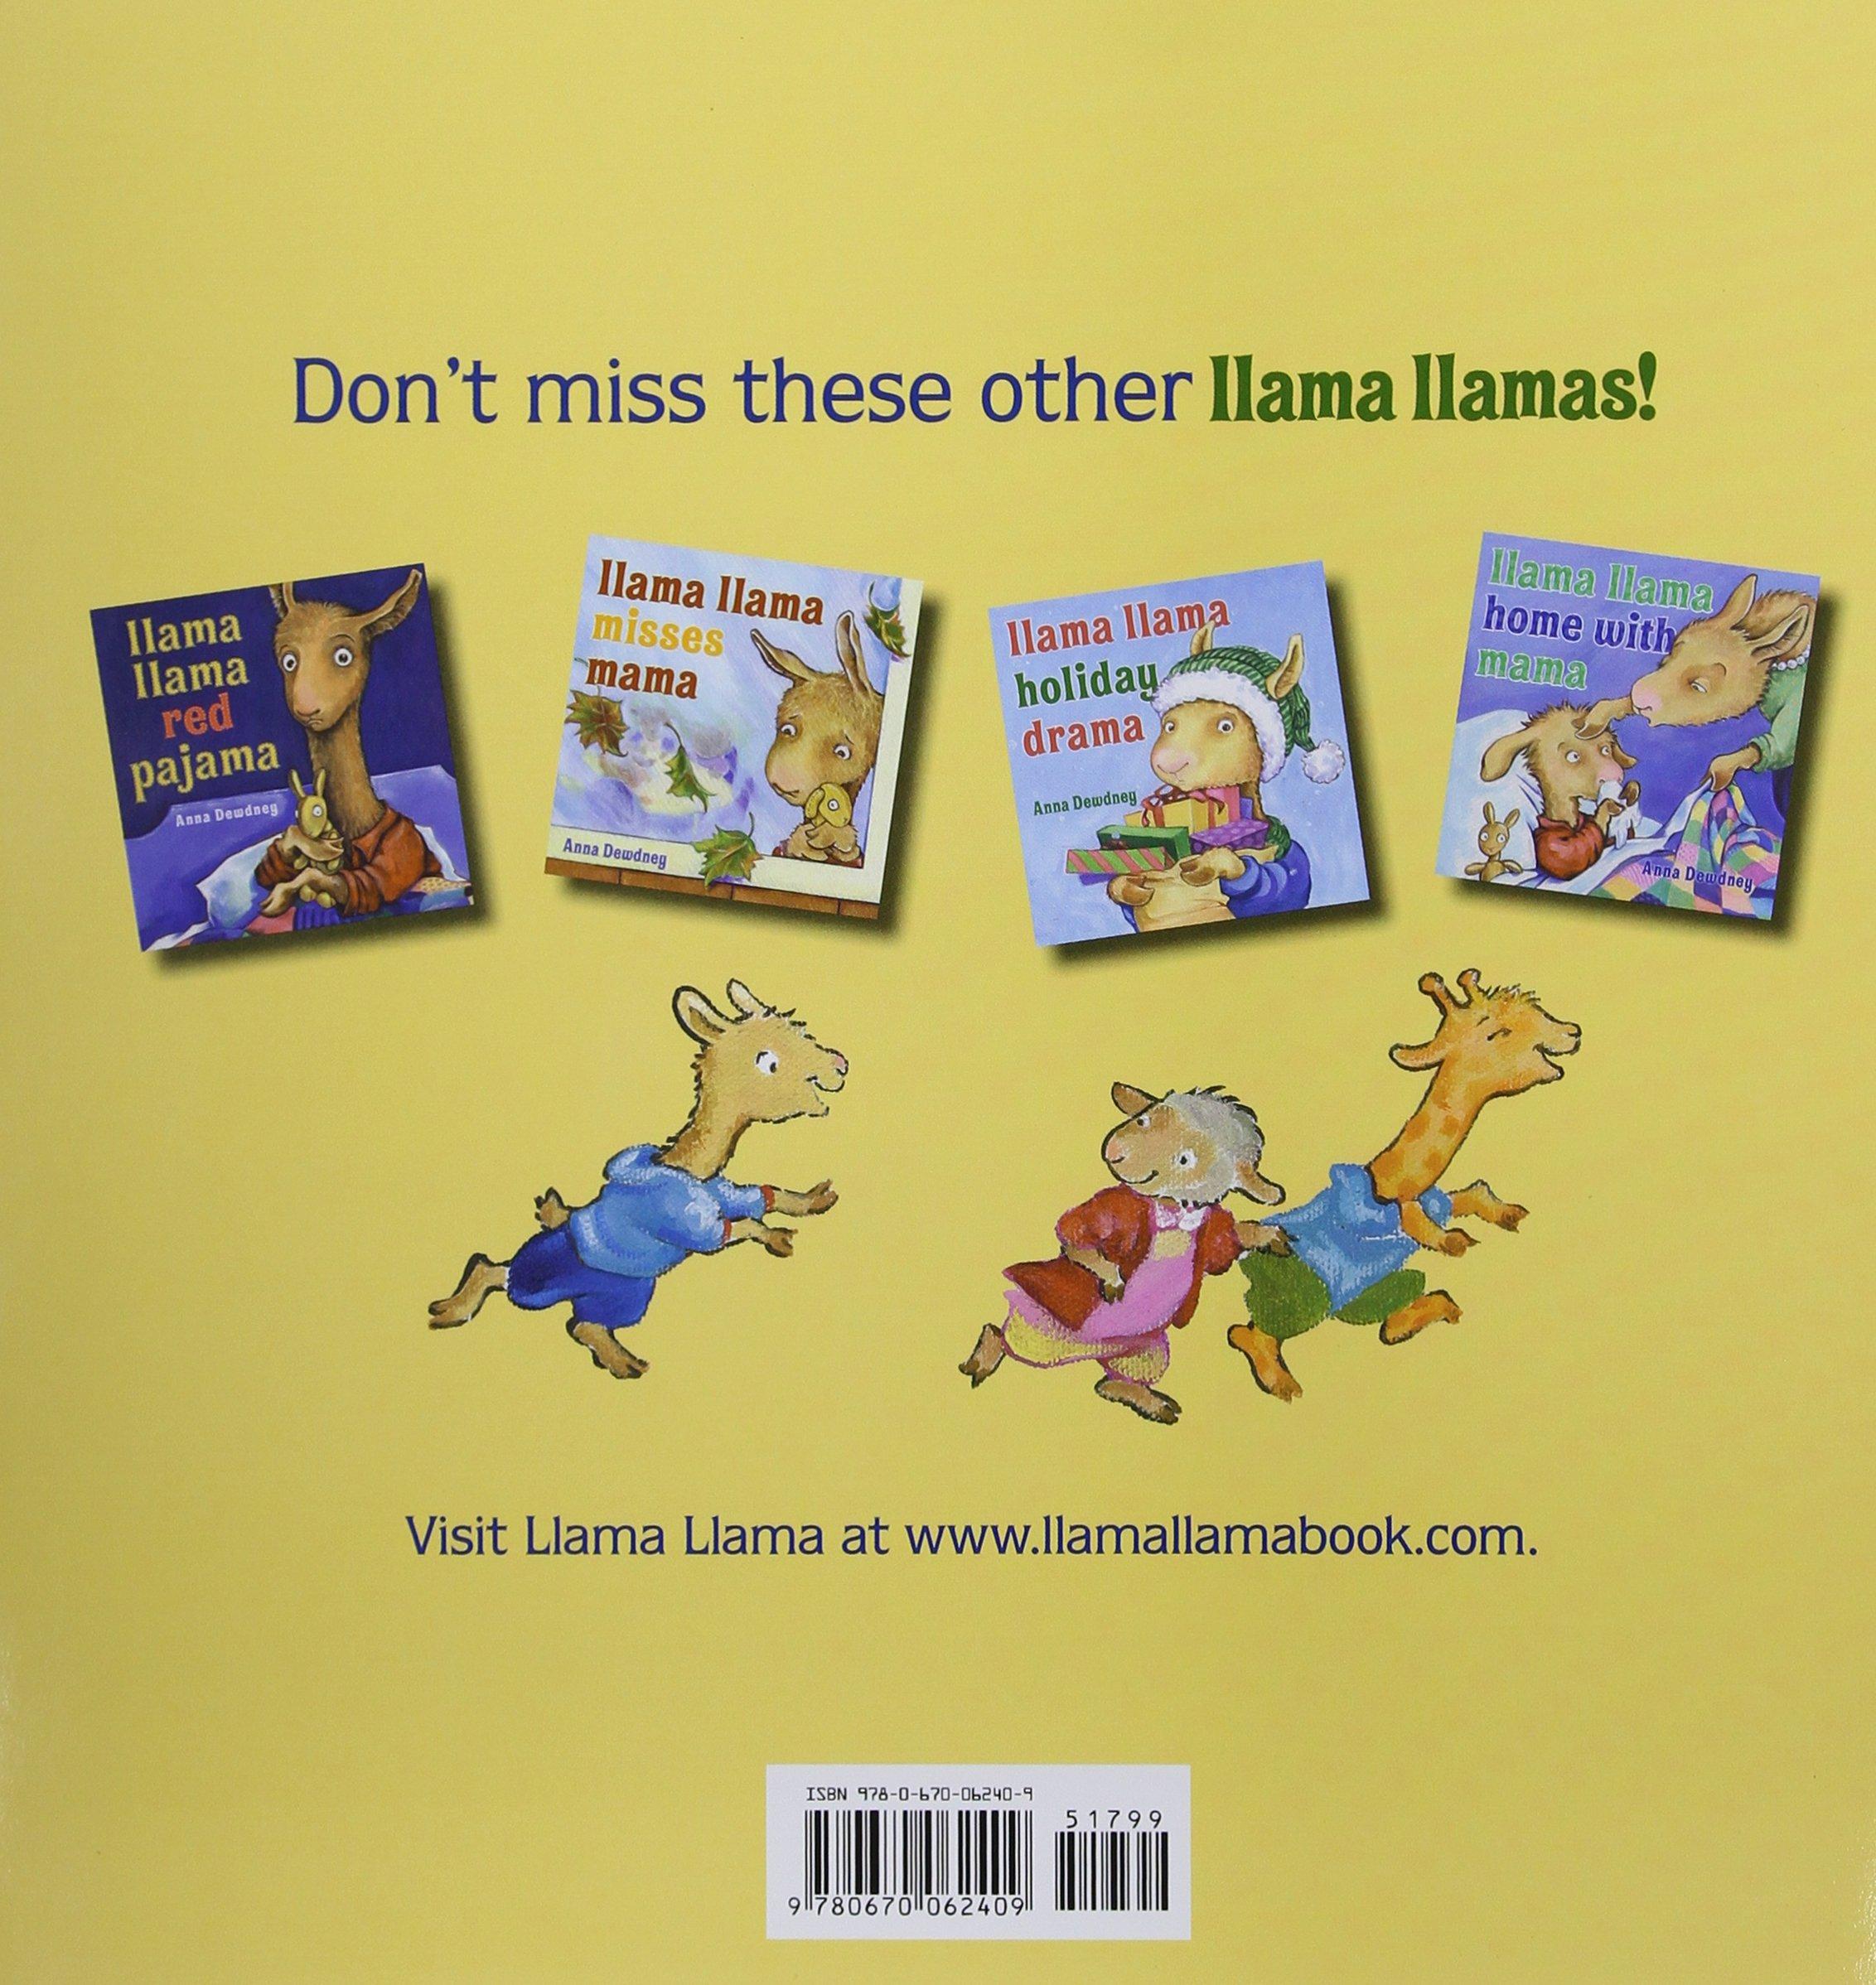 llama llama mad at mama anna dewdney 9780670062409 amazon com